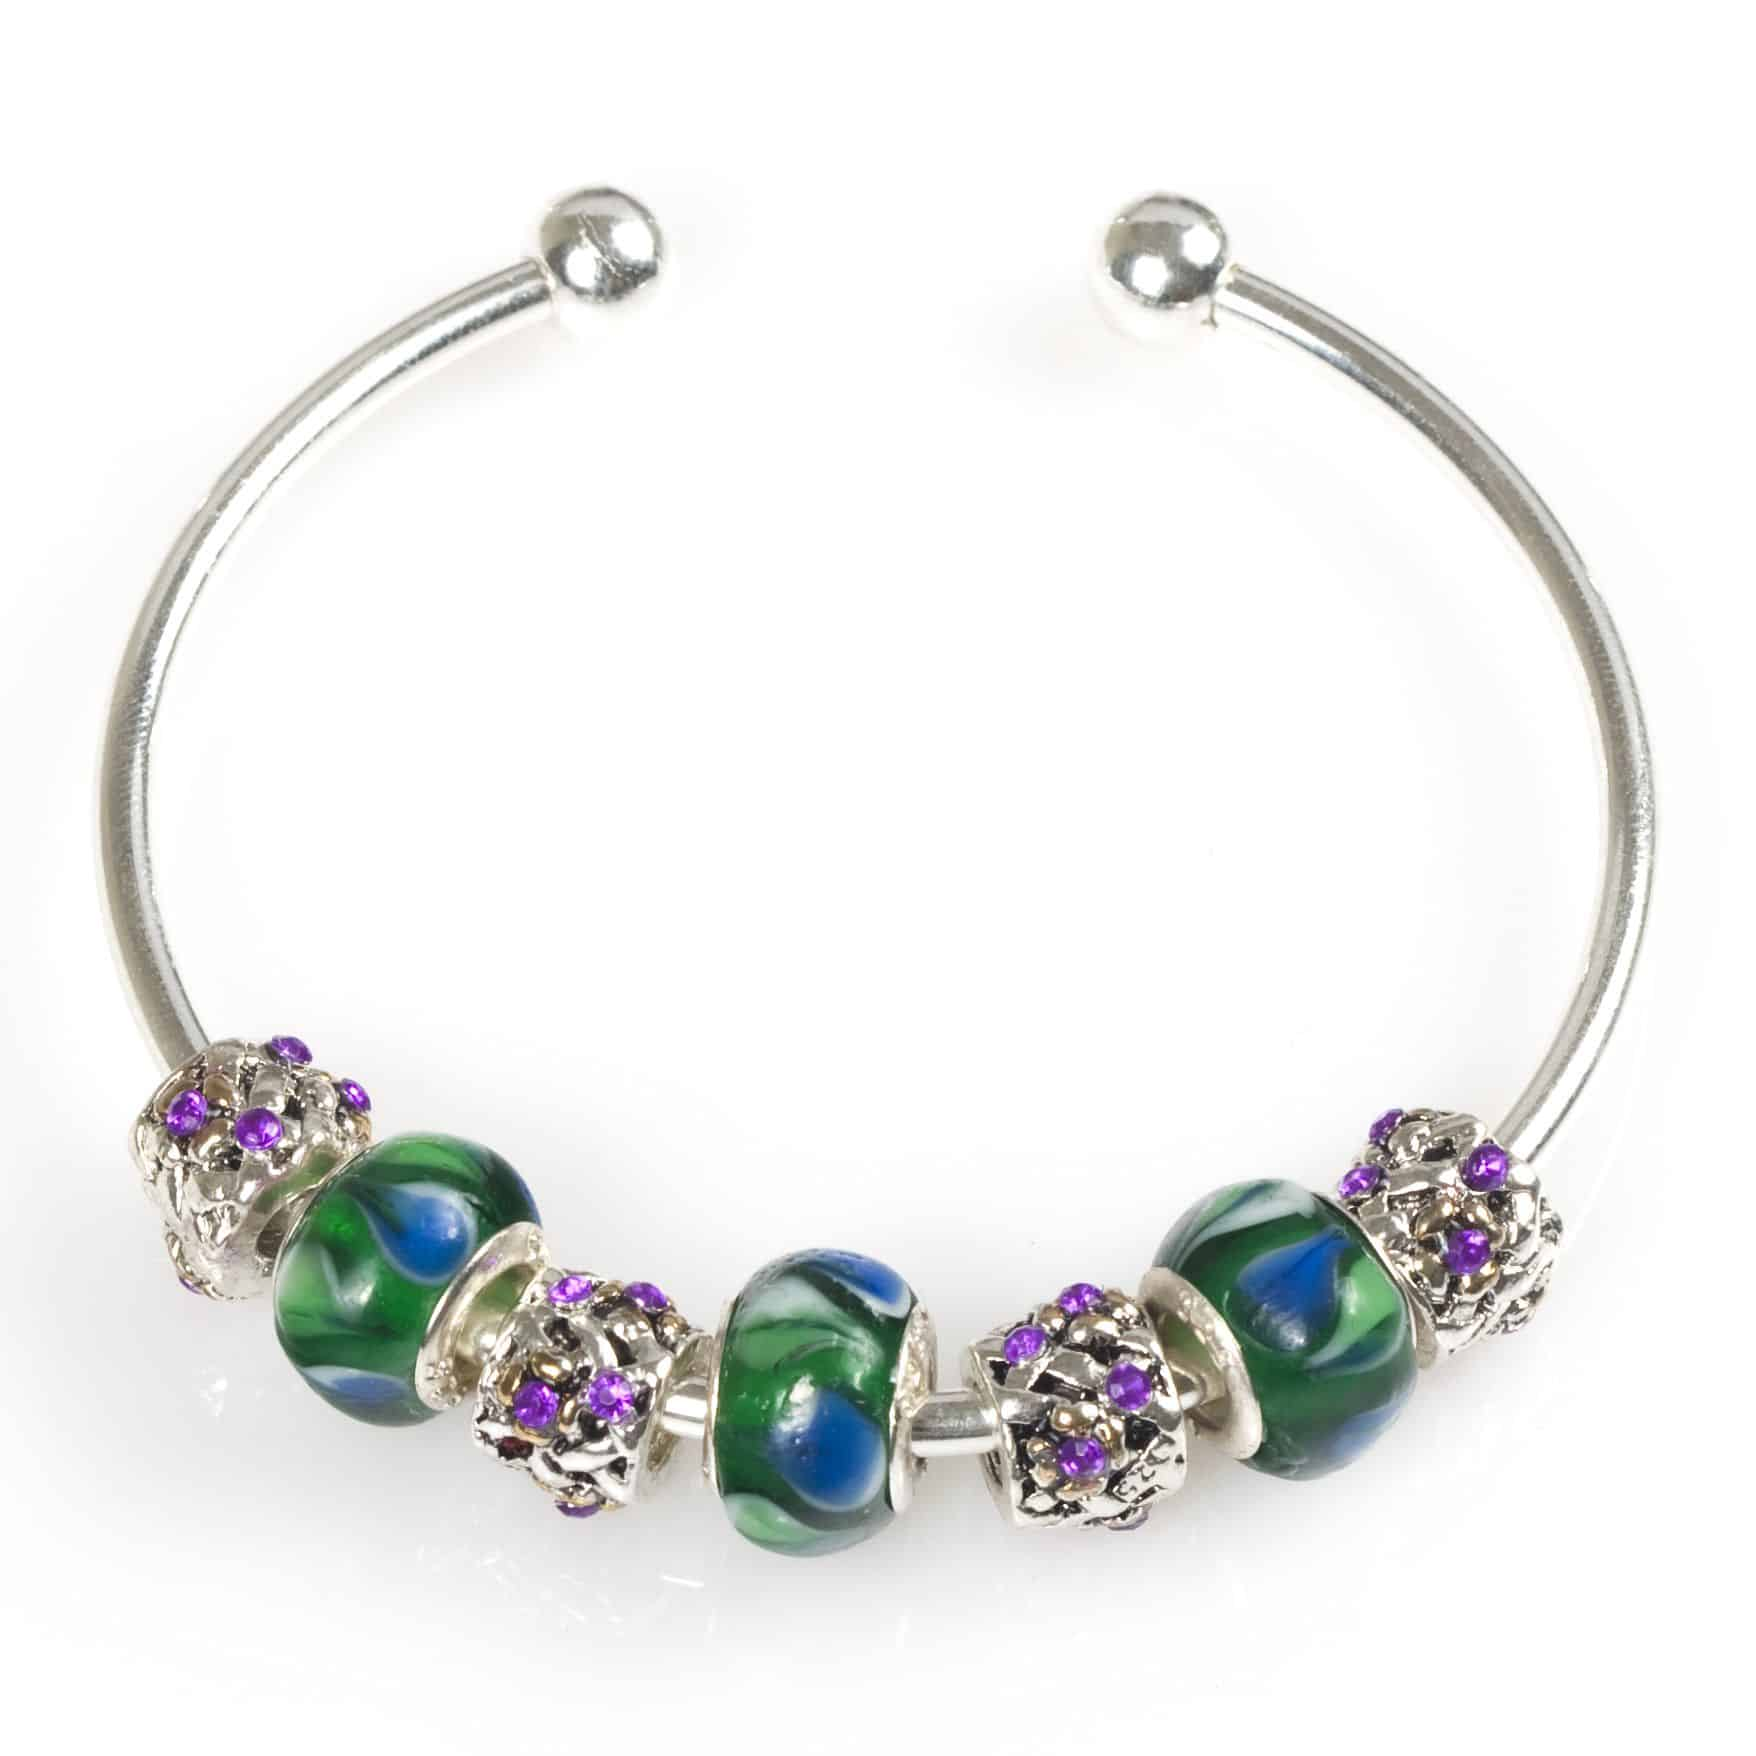 stunning pandora bracelet design ideas images decorating the - Pandora Bracelet Design Ideas